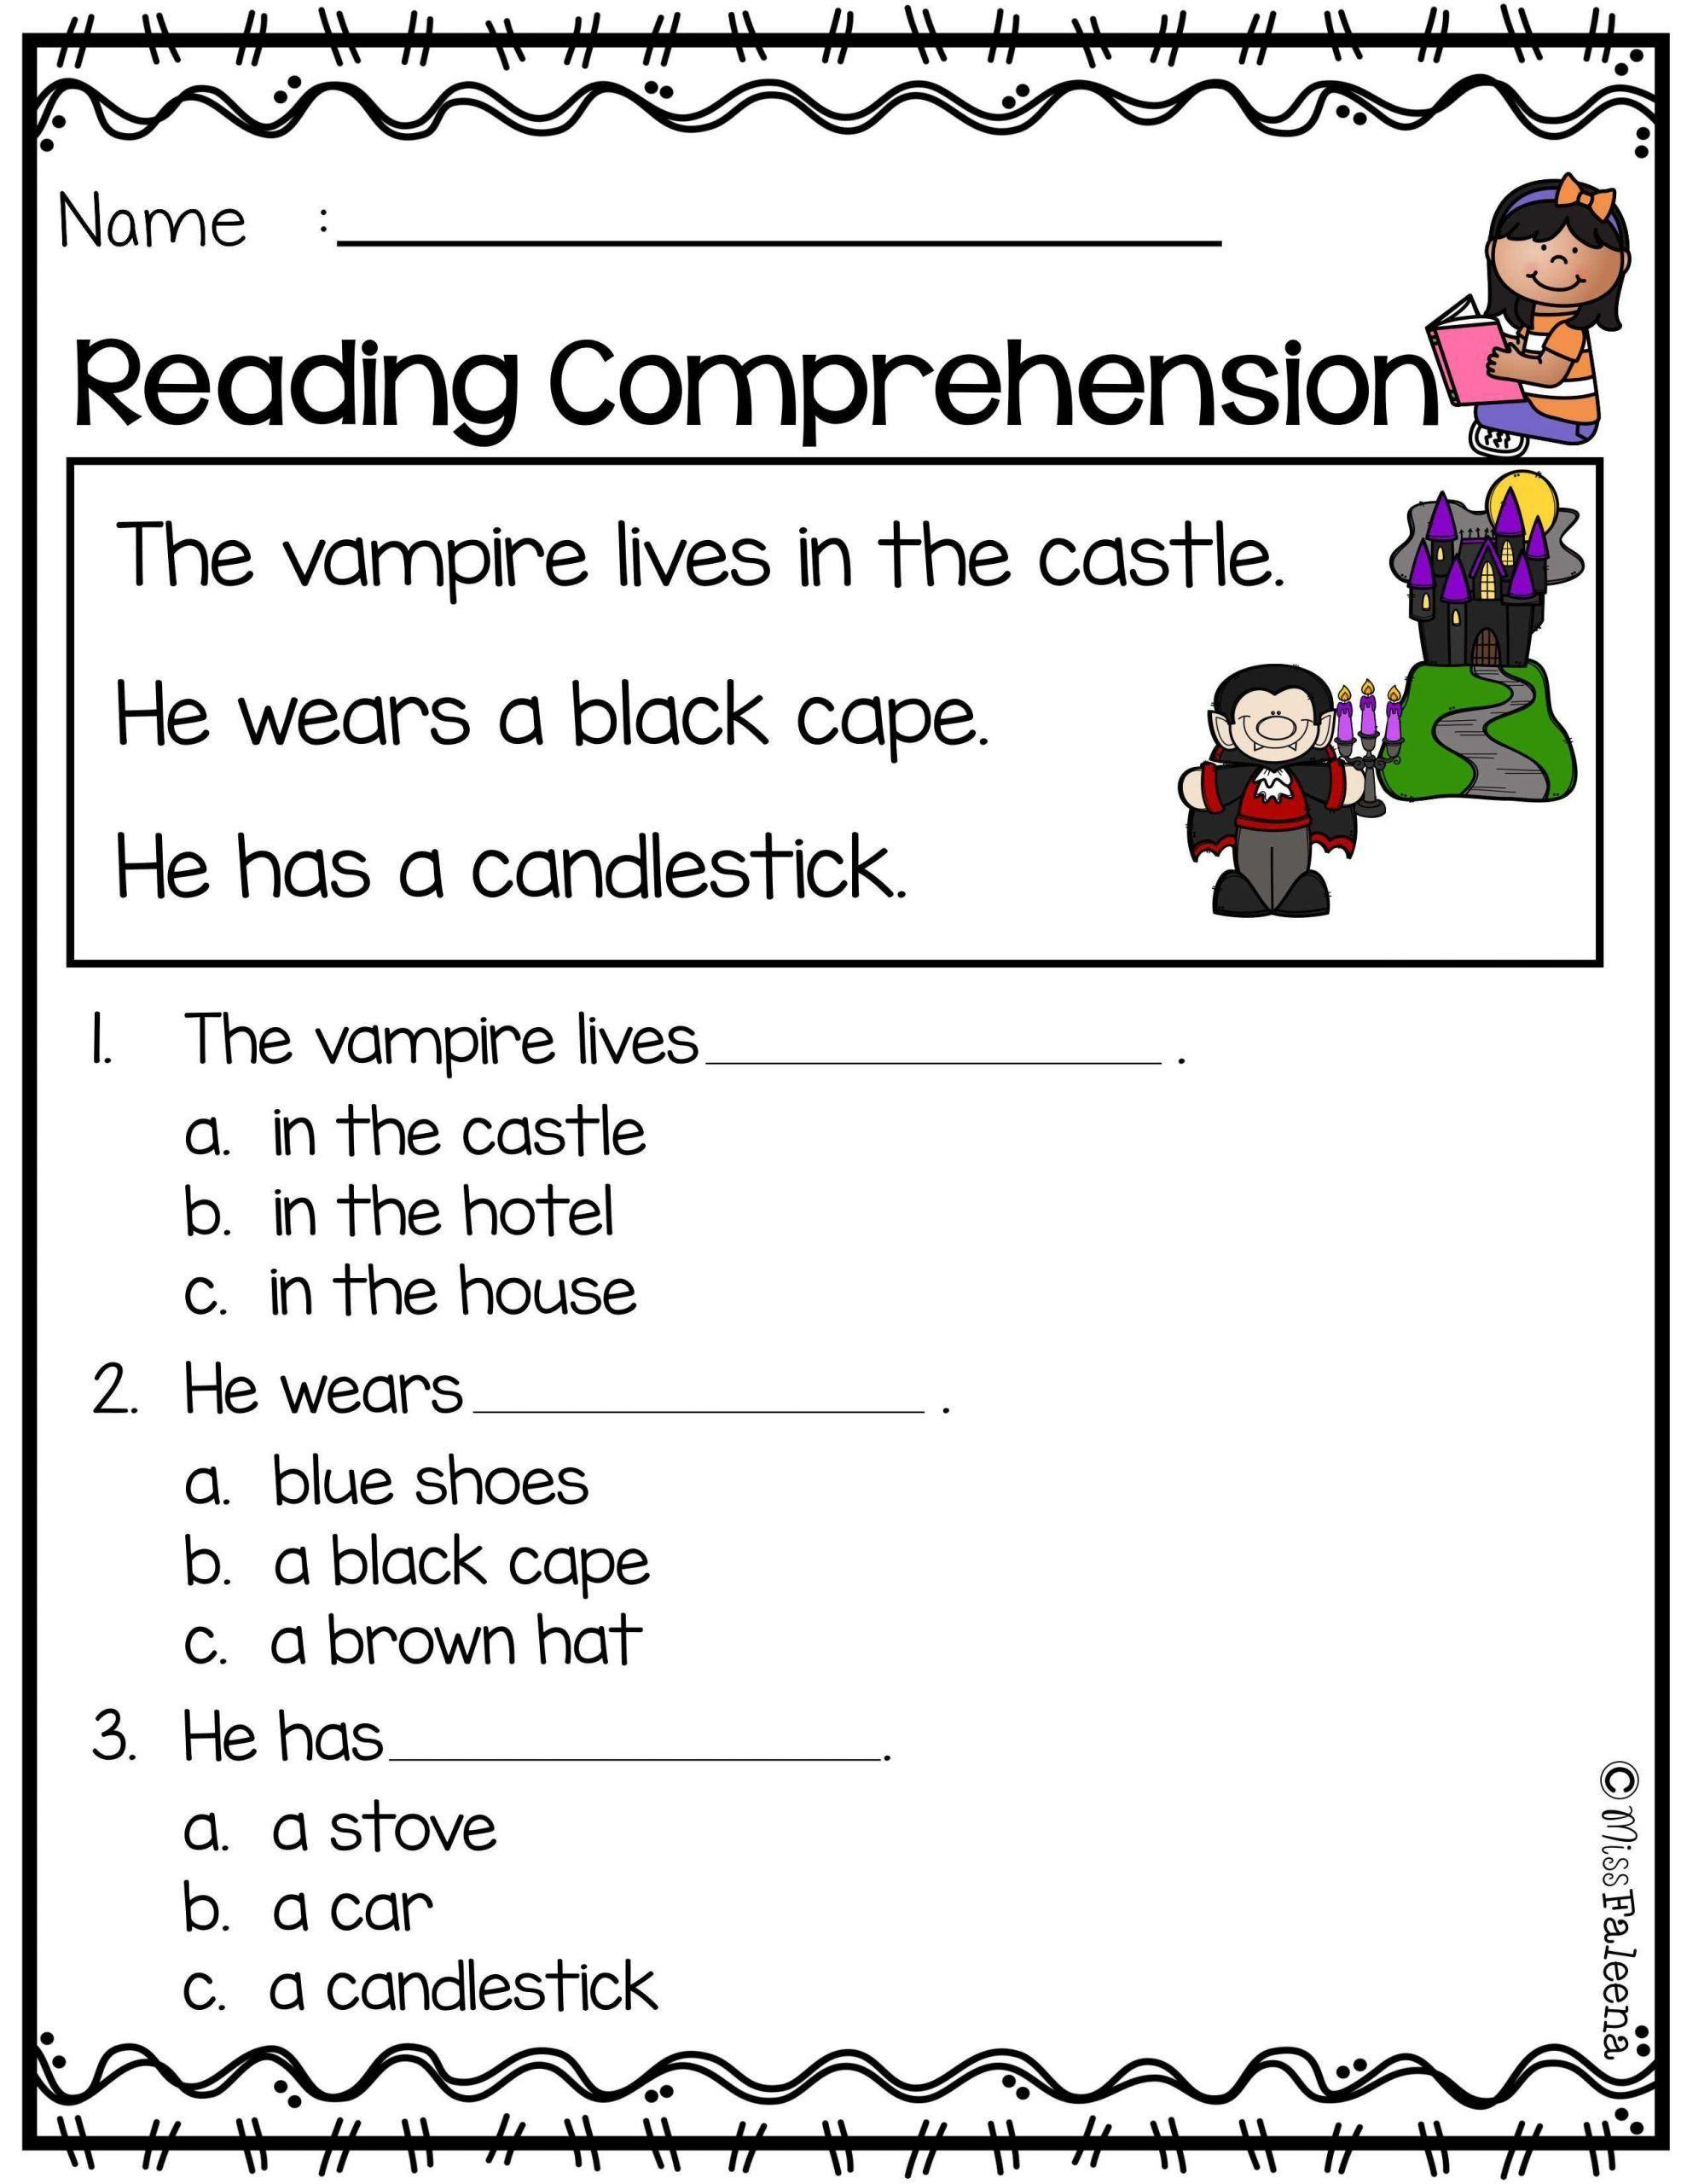 Kindergarten Worksheets Reading Comprehension October Reading Prehension Reading Comprehension Kindergarten Reading Worksheets Reading Worksheets [ 2560 x 1978 Pixel ]